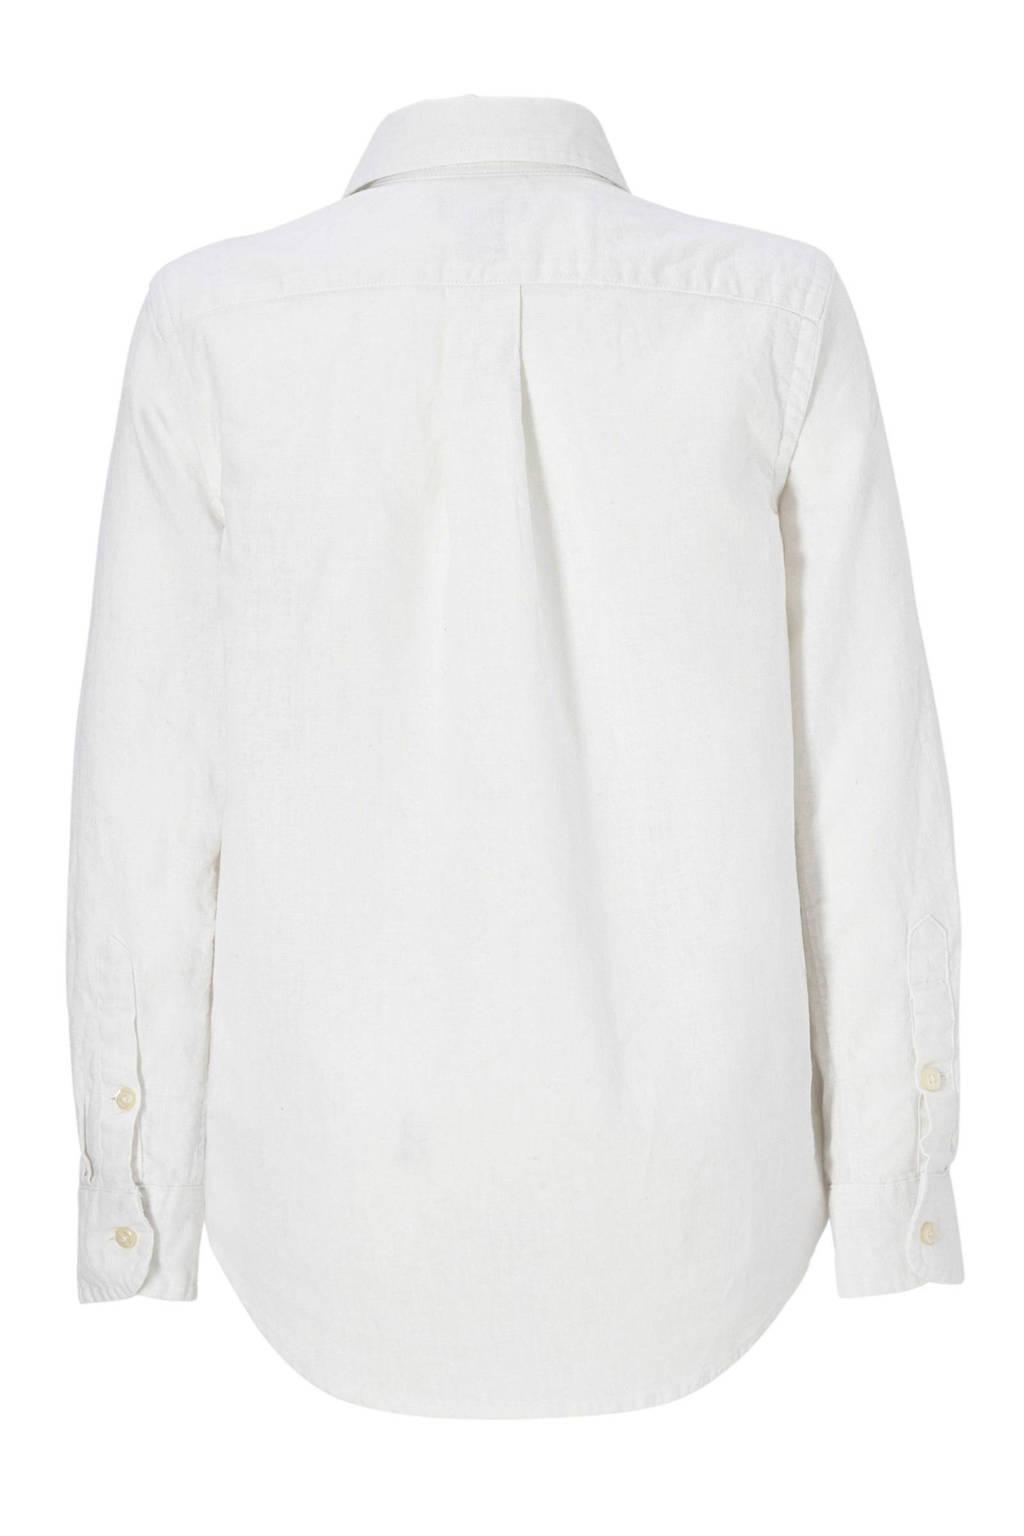 POLO Ralph Lauren overhemd, Wit